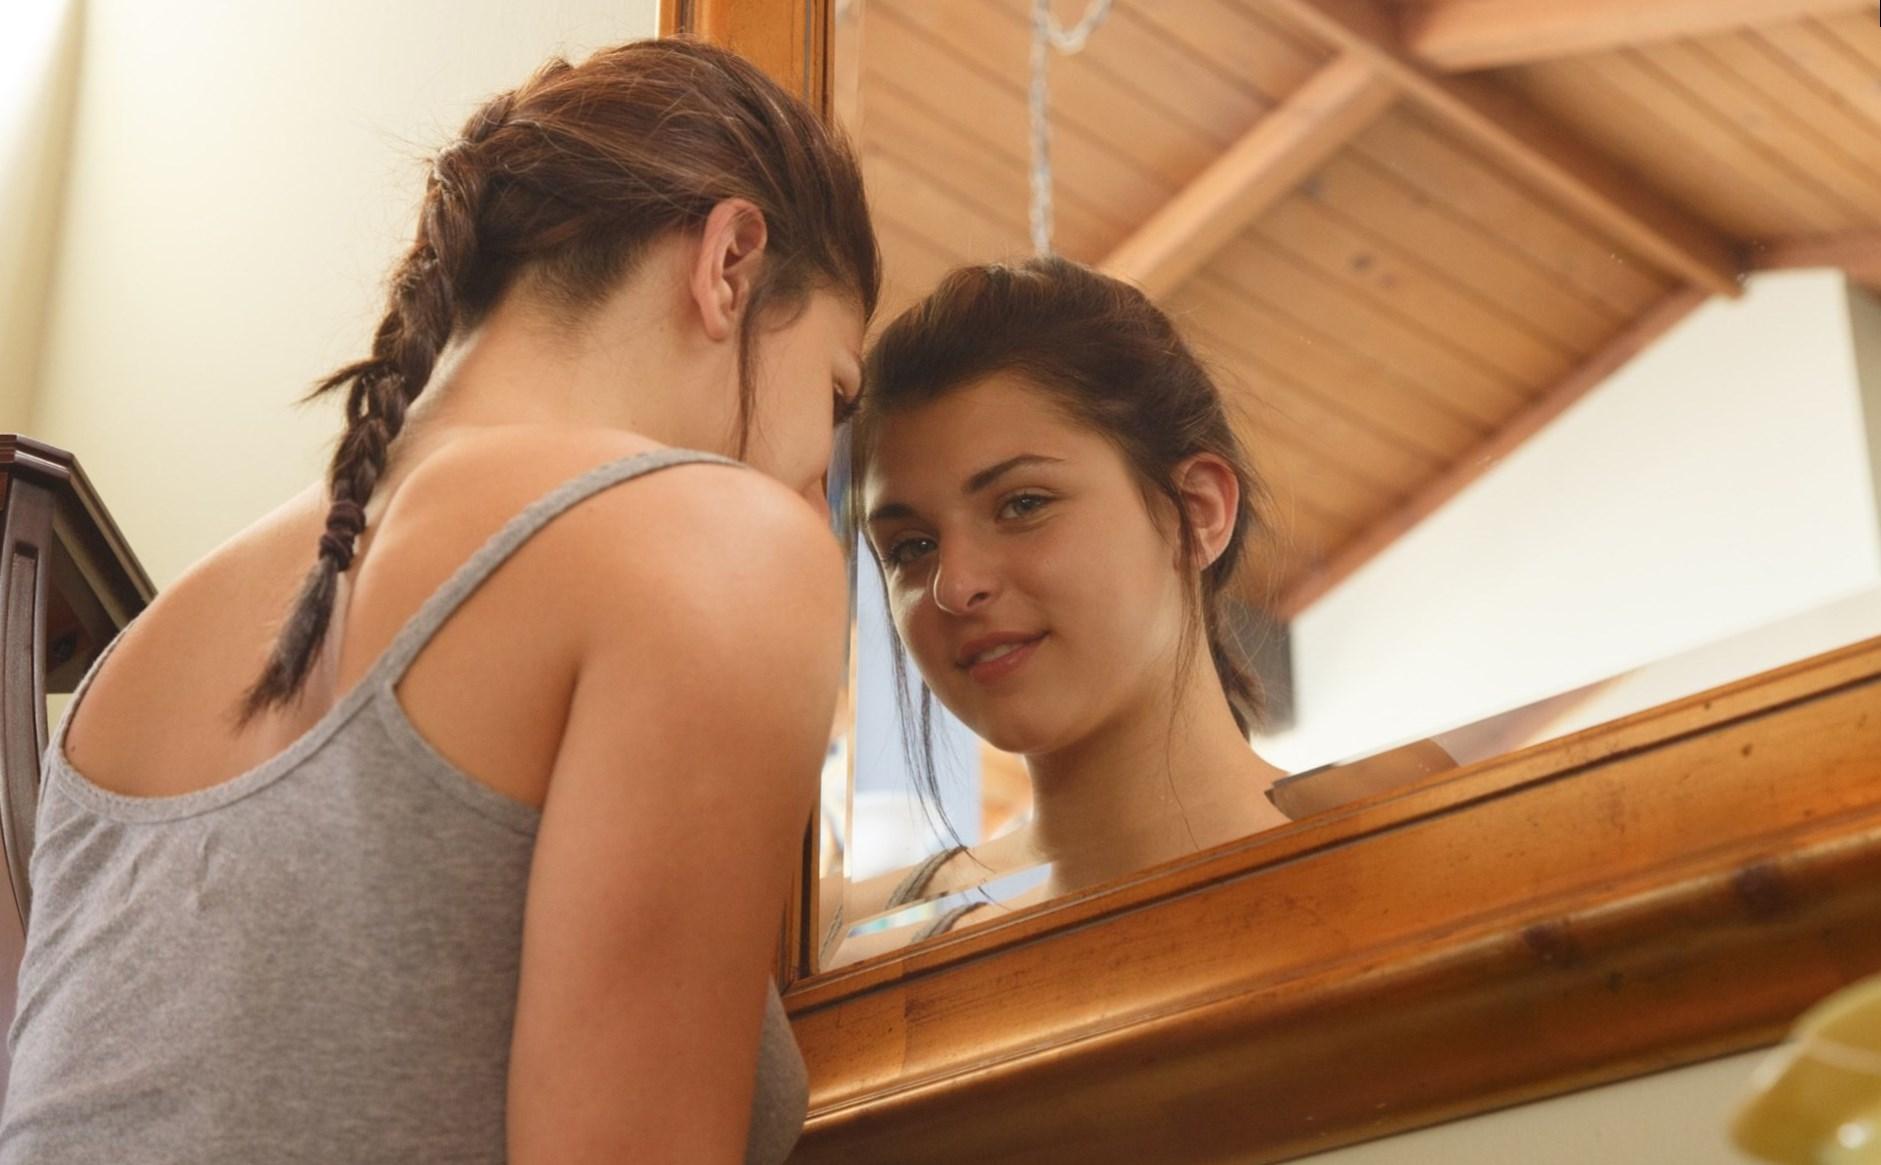 Teen girls Nina North and Leah Gotti kiss before having a threesome № 1518942 загрузить